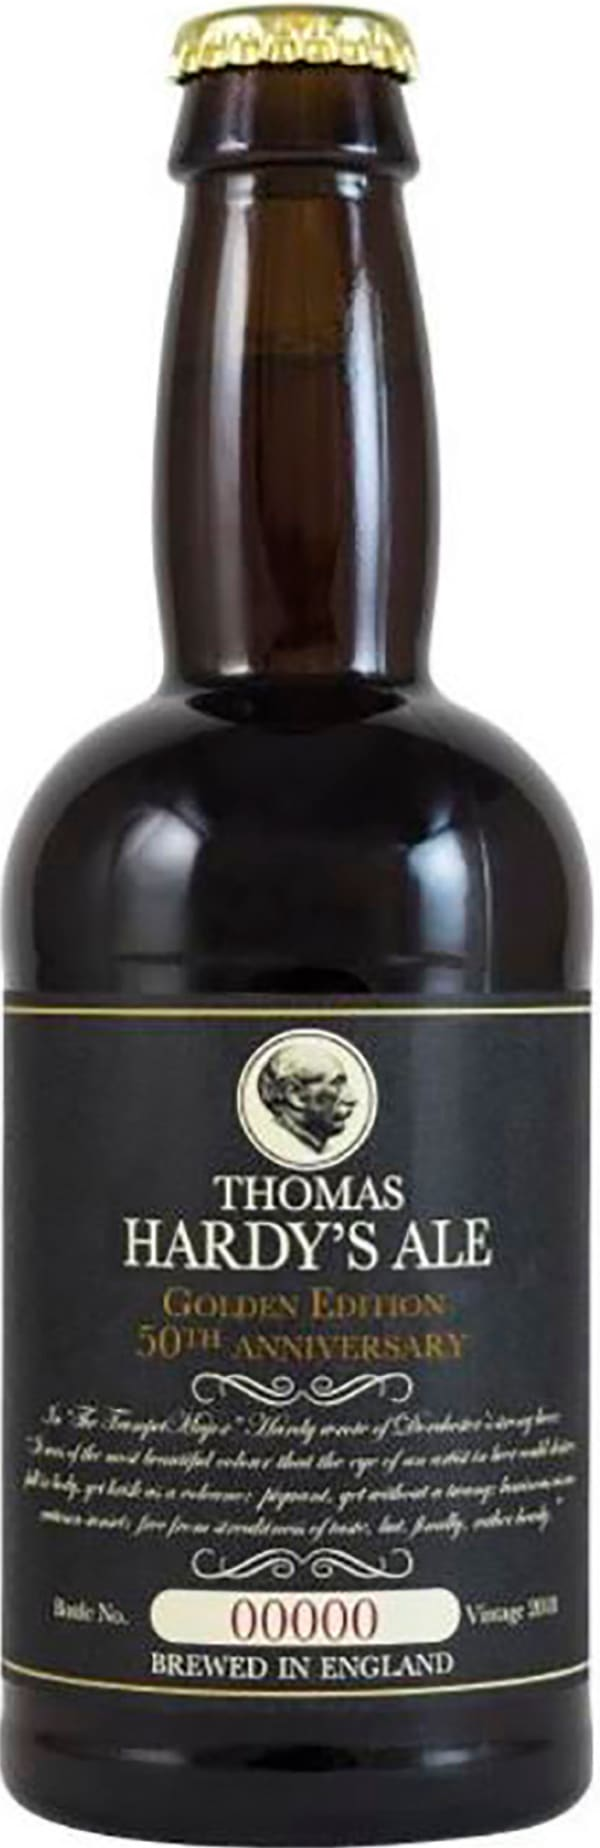 Thomas Hardy's Ale 2018